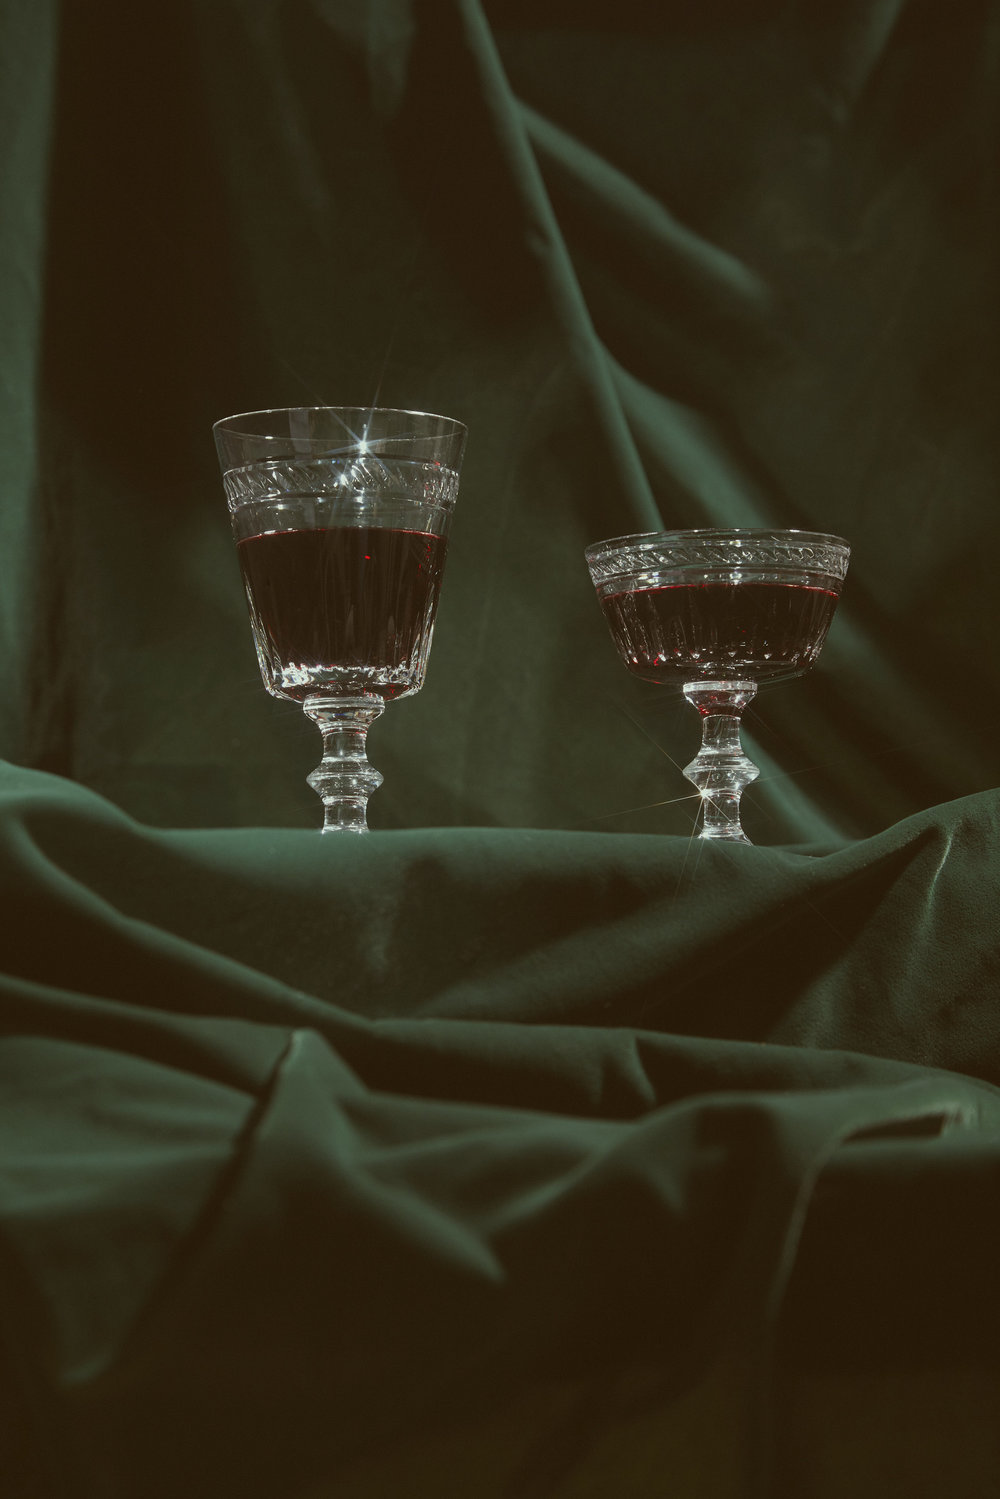 161213_glassware17307.jpg